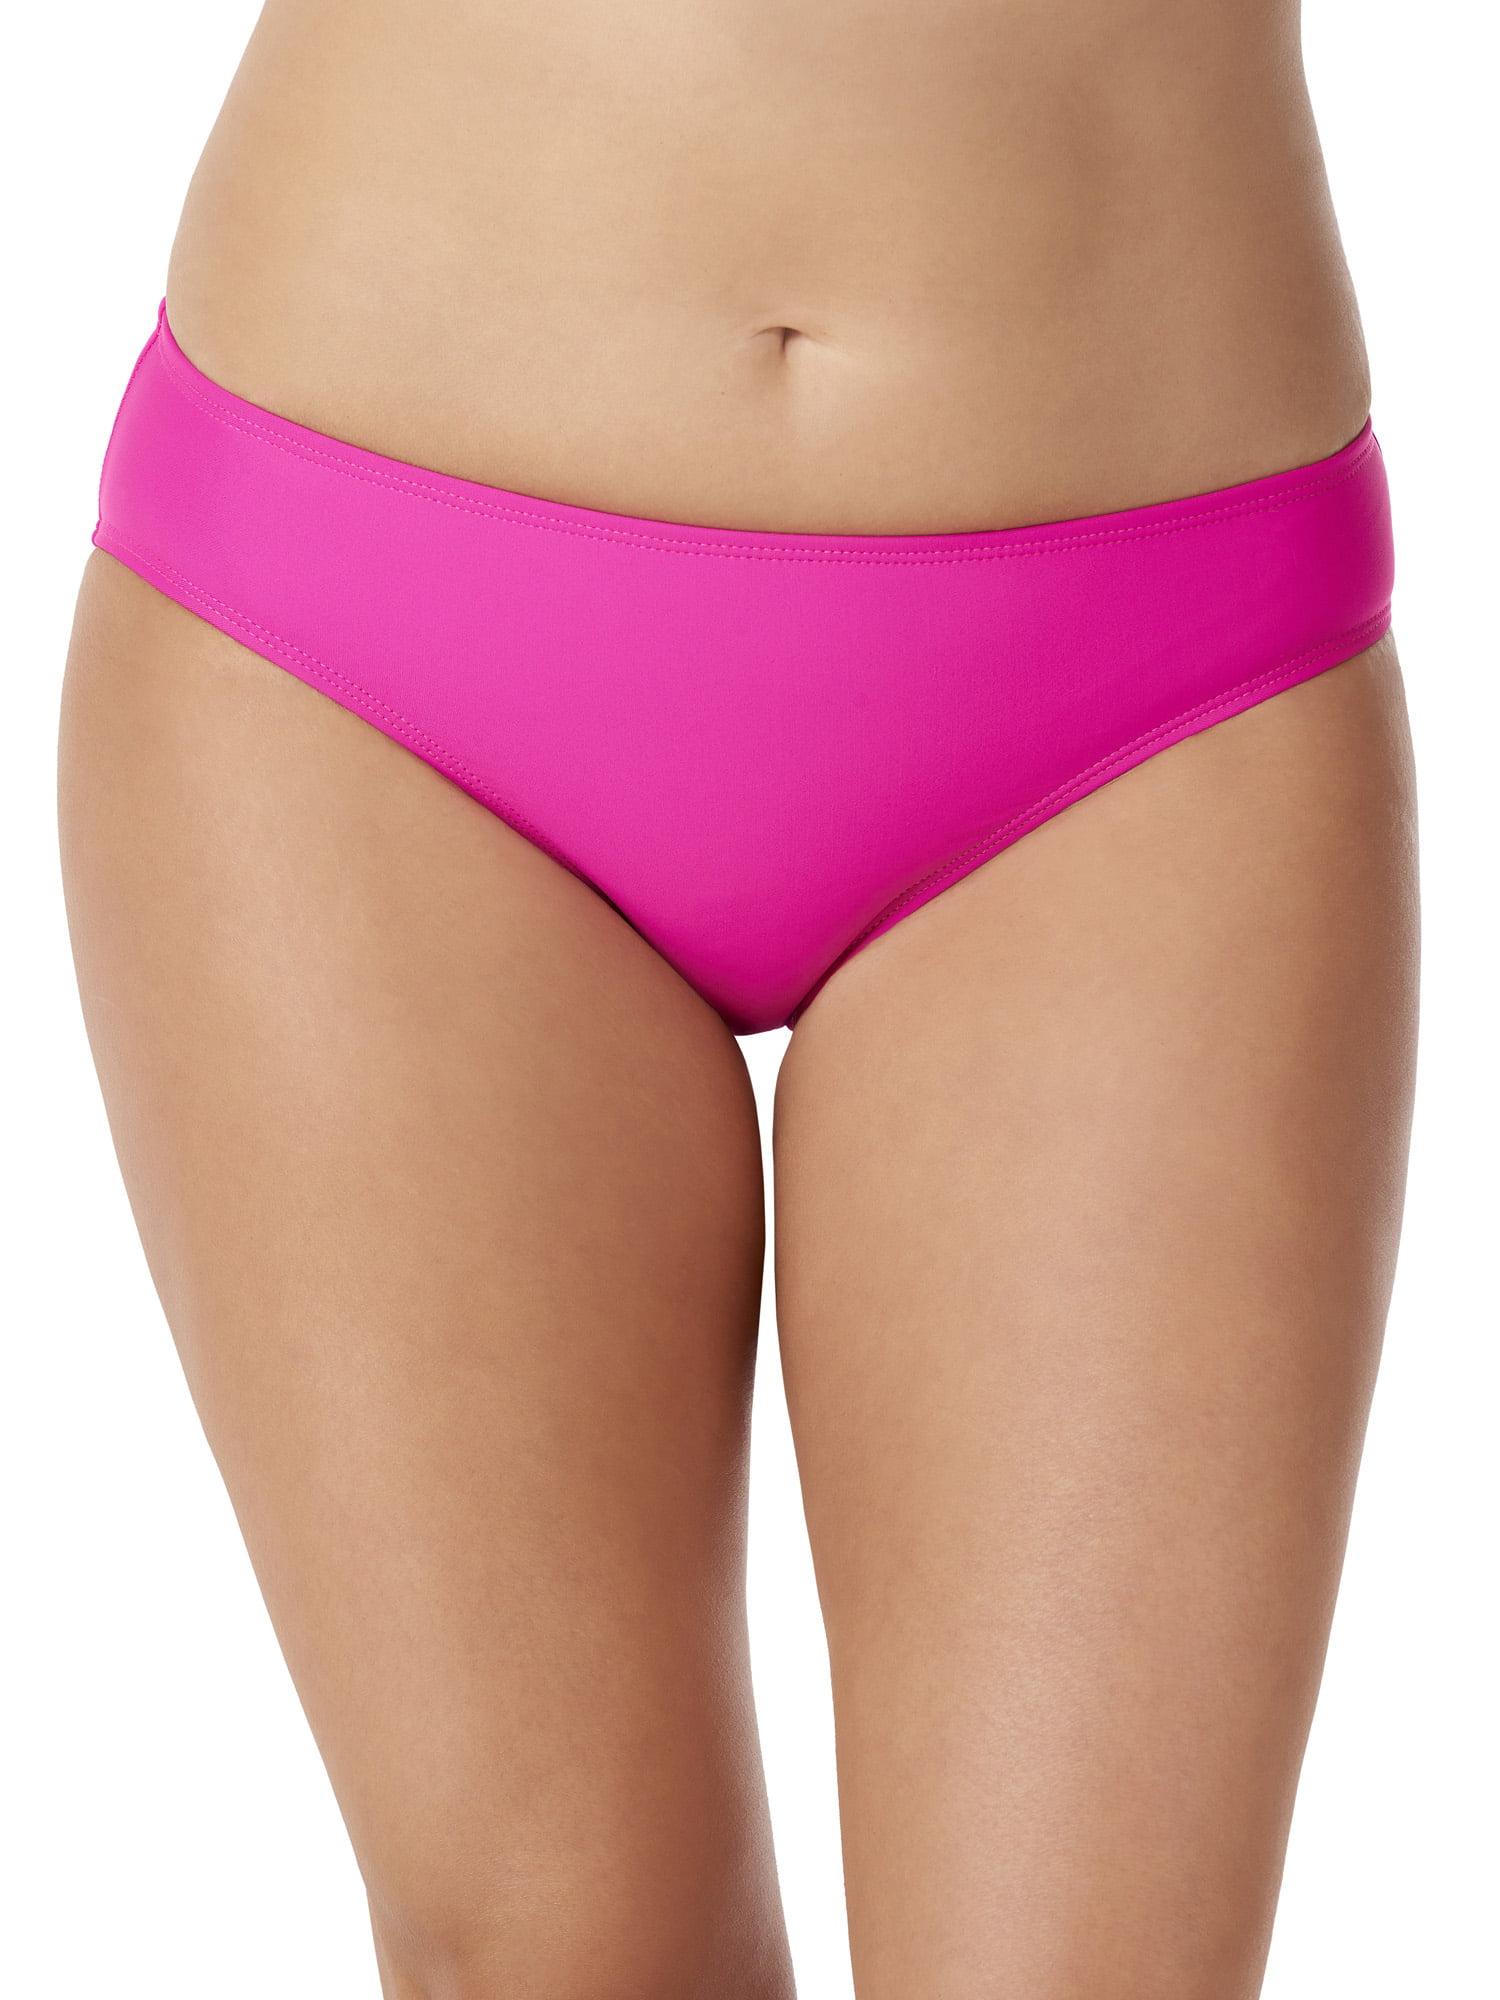 Women's Sassy Bikini Bottom with Ruched Back